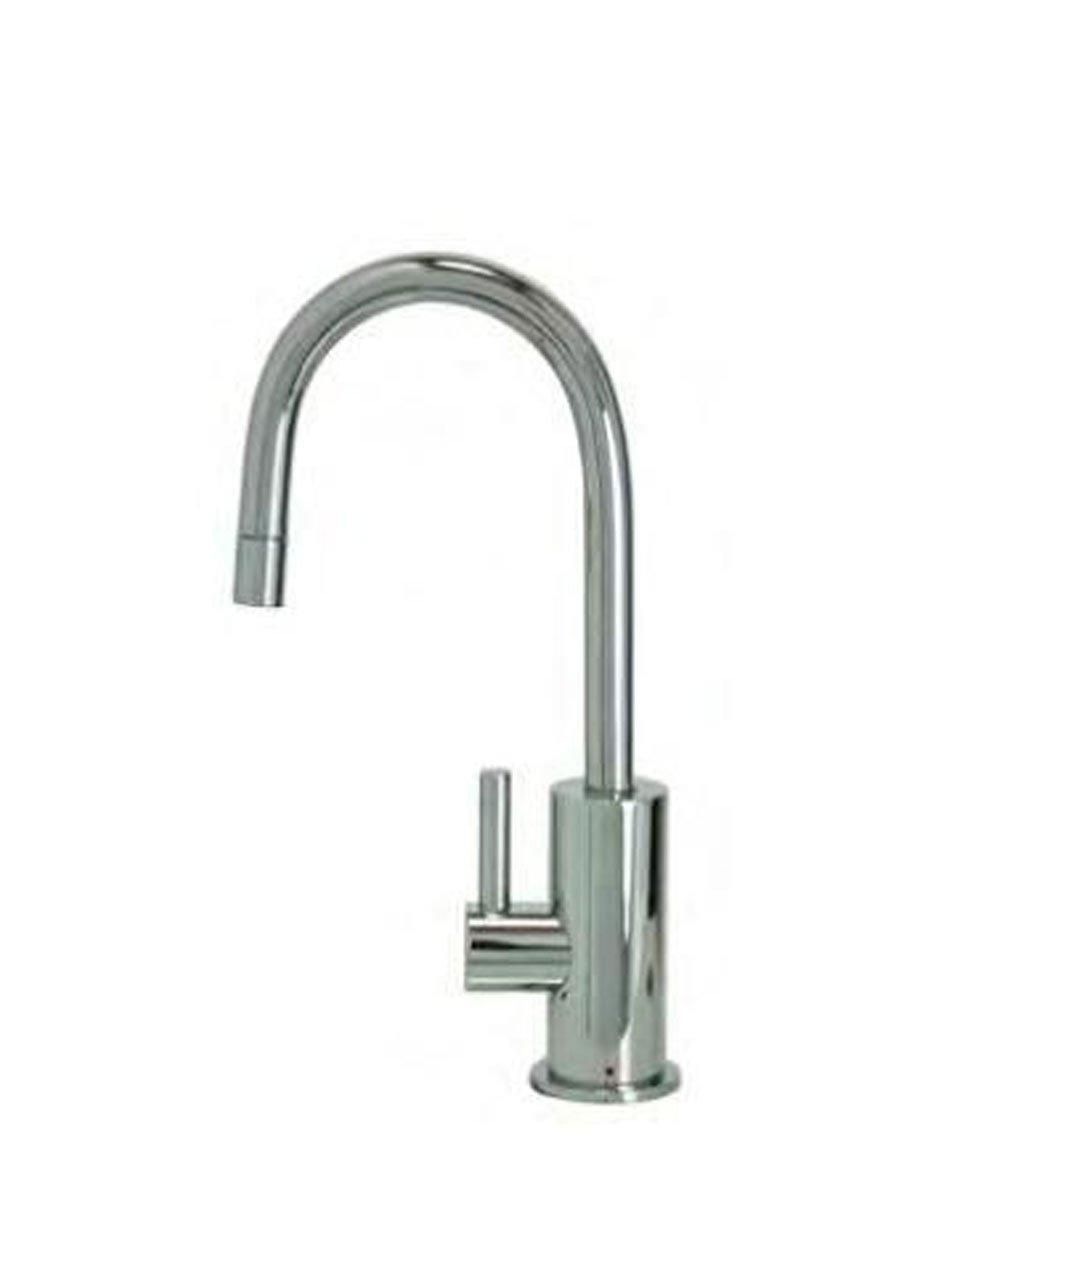 Mountain Plumbing MT1840-NL/CPB Little Gourmet Hot Water Dispenser, Polished Chrome